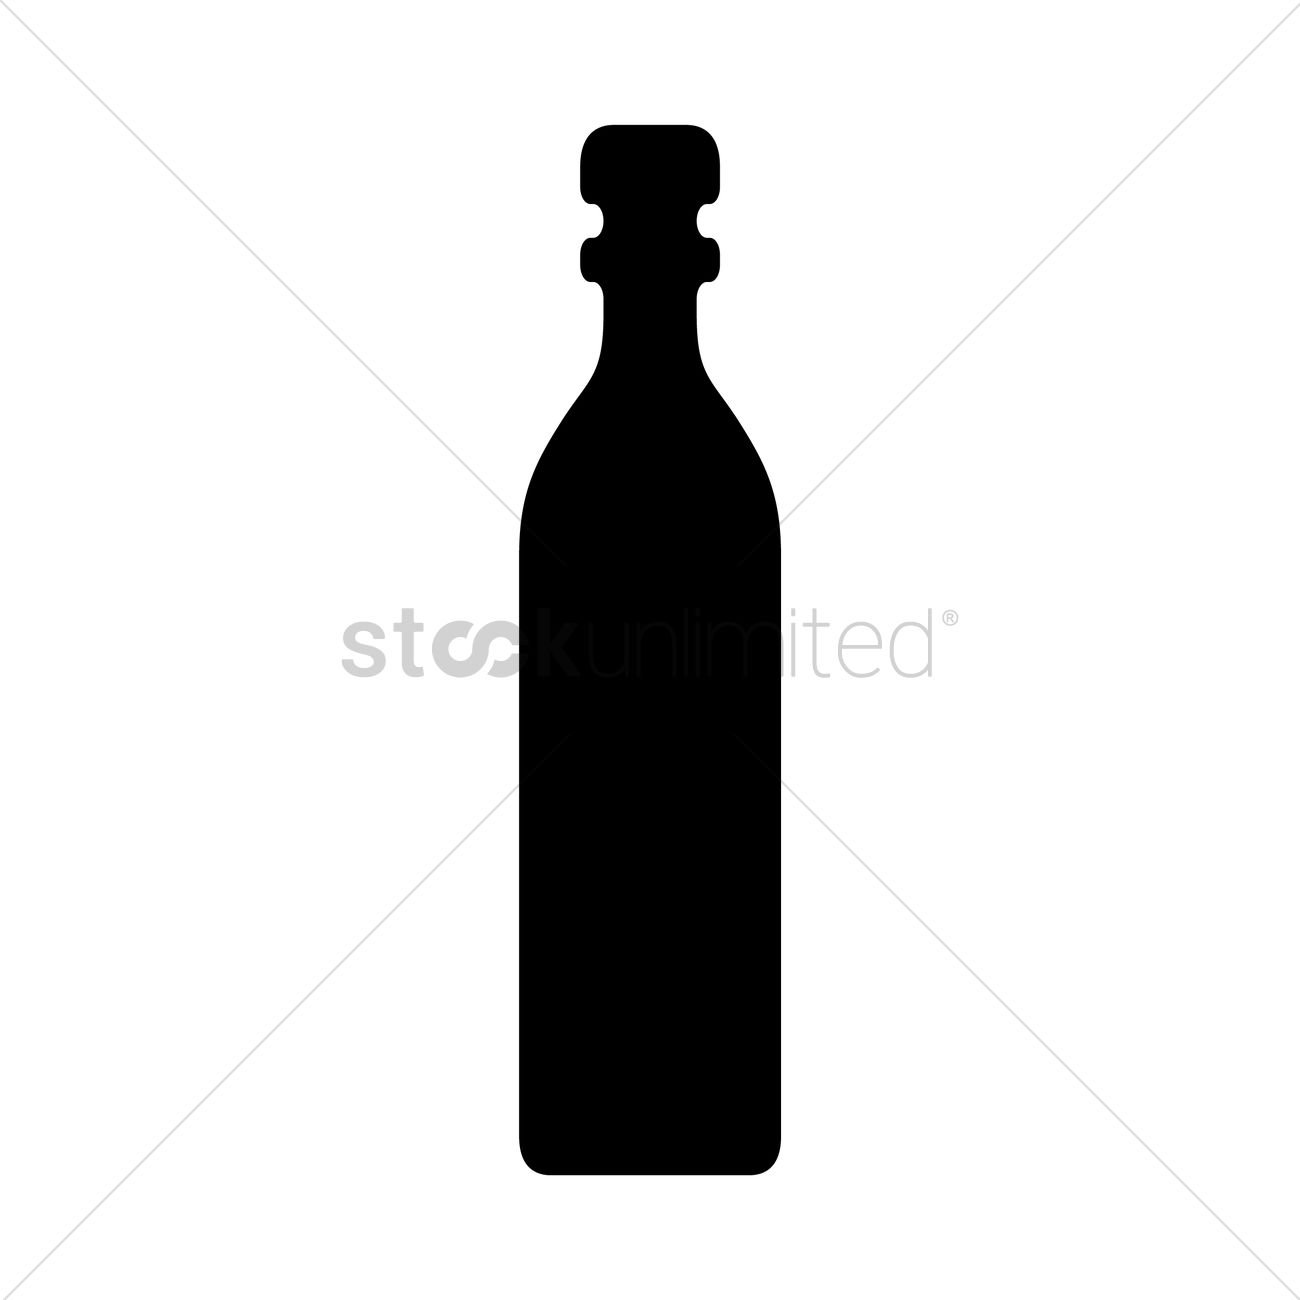 1300x1300 Bottle Silhouette Vector Image